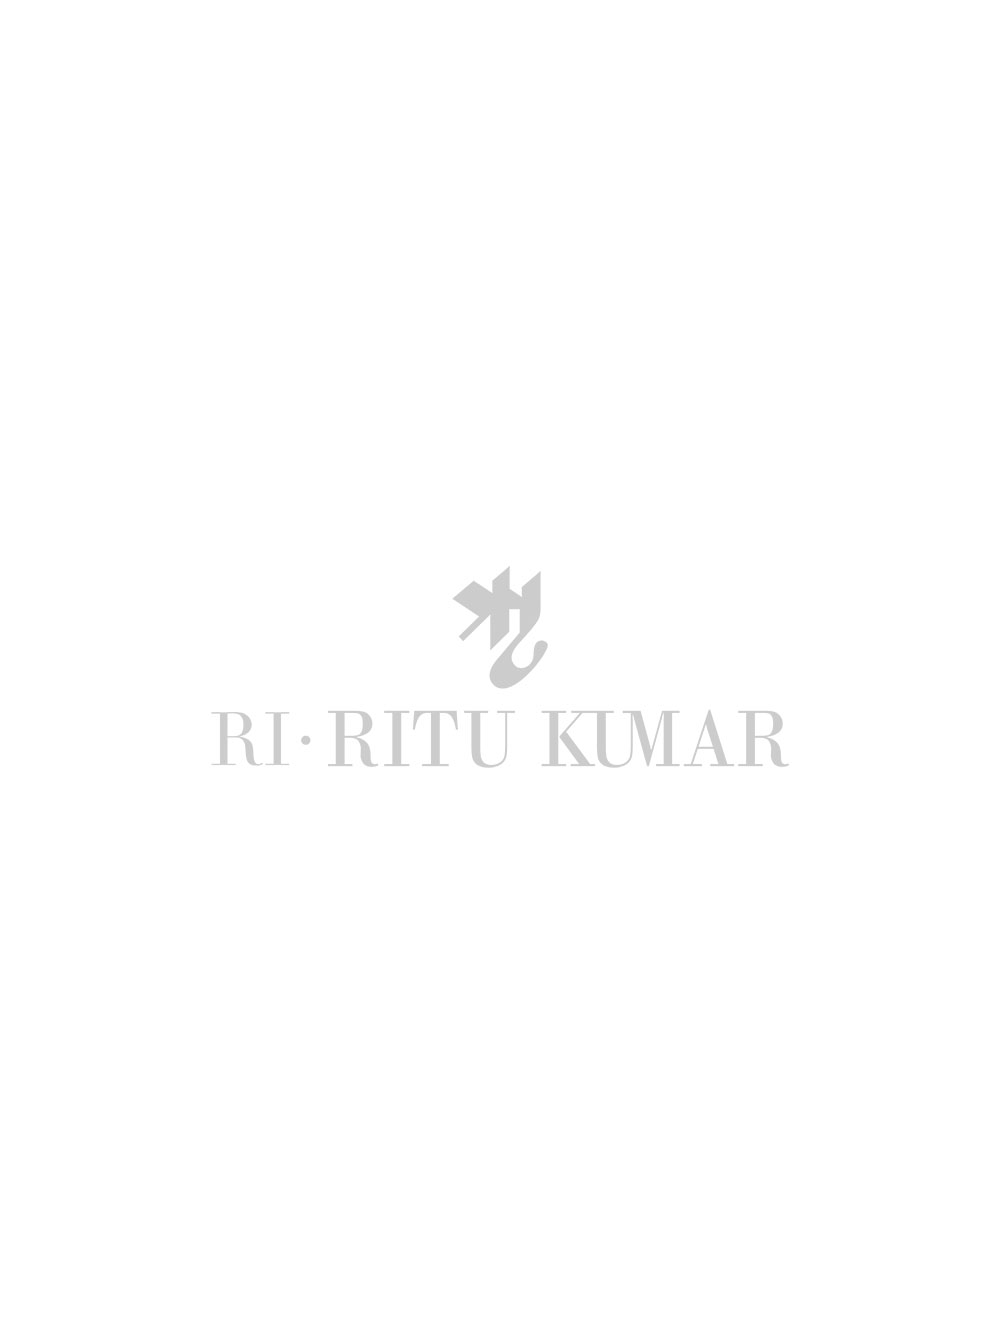 Midnight Children's Collection by Ritu Kumar